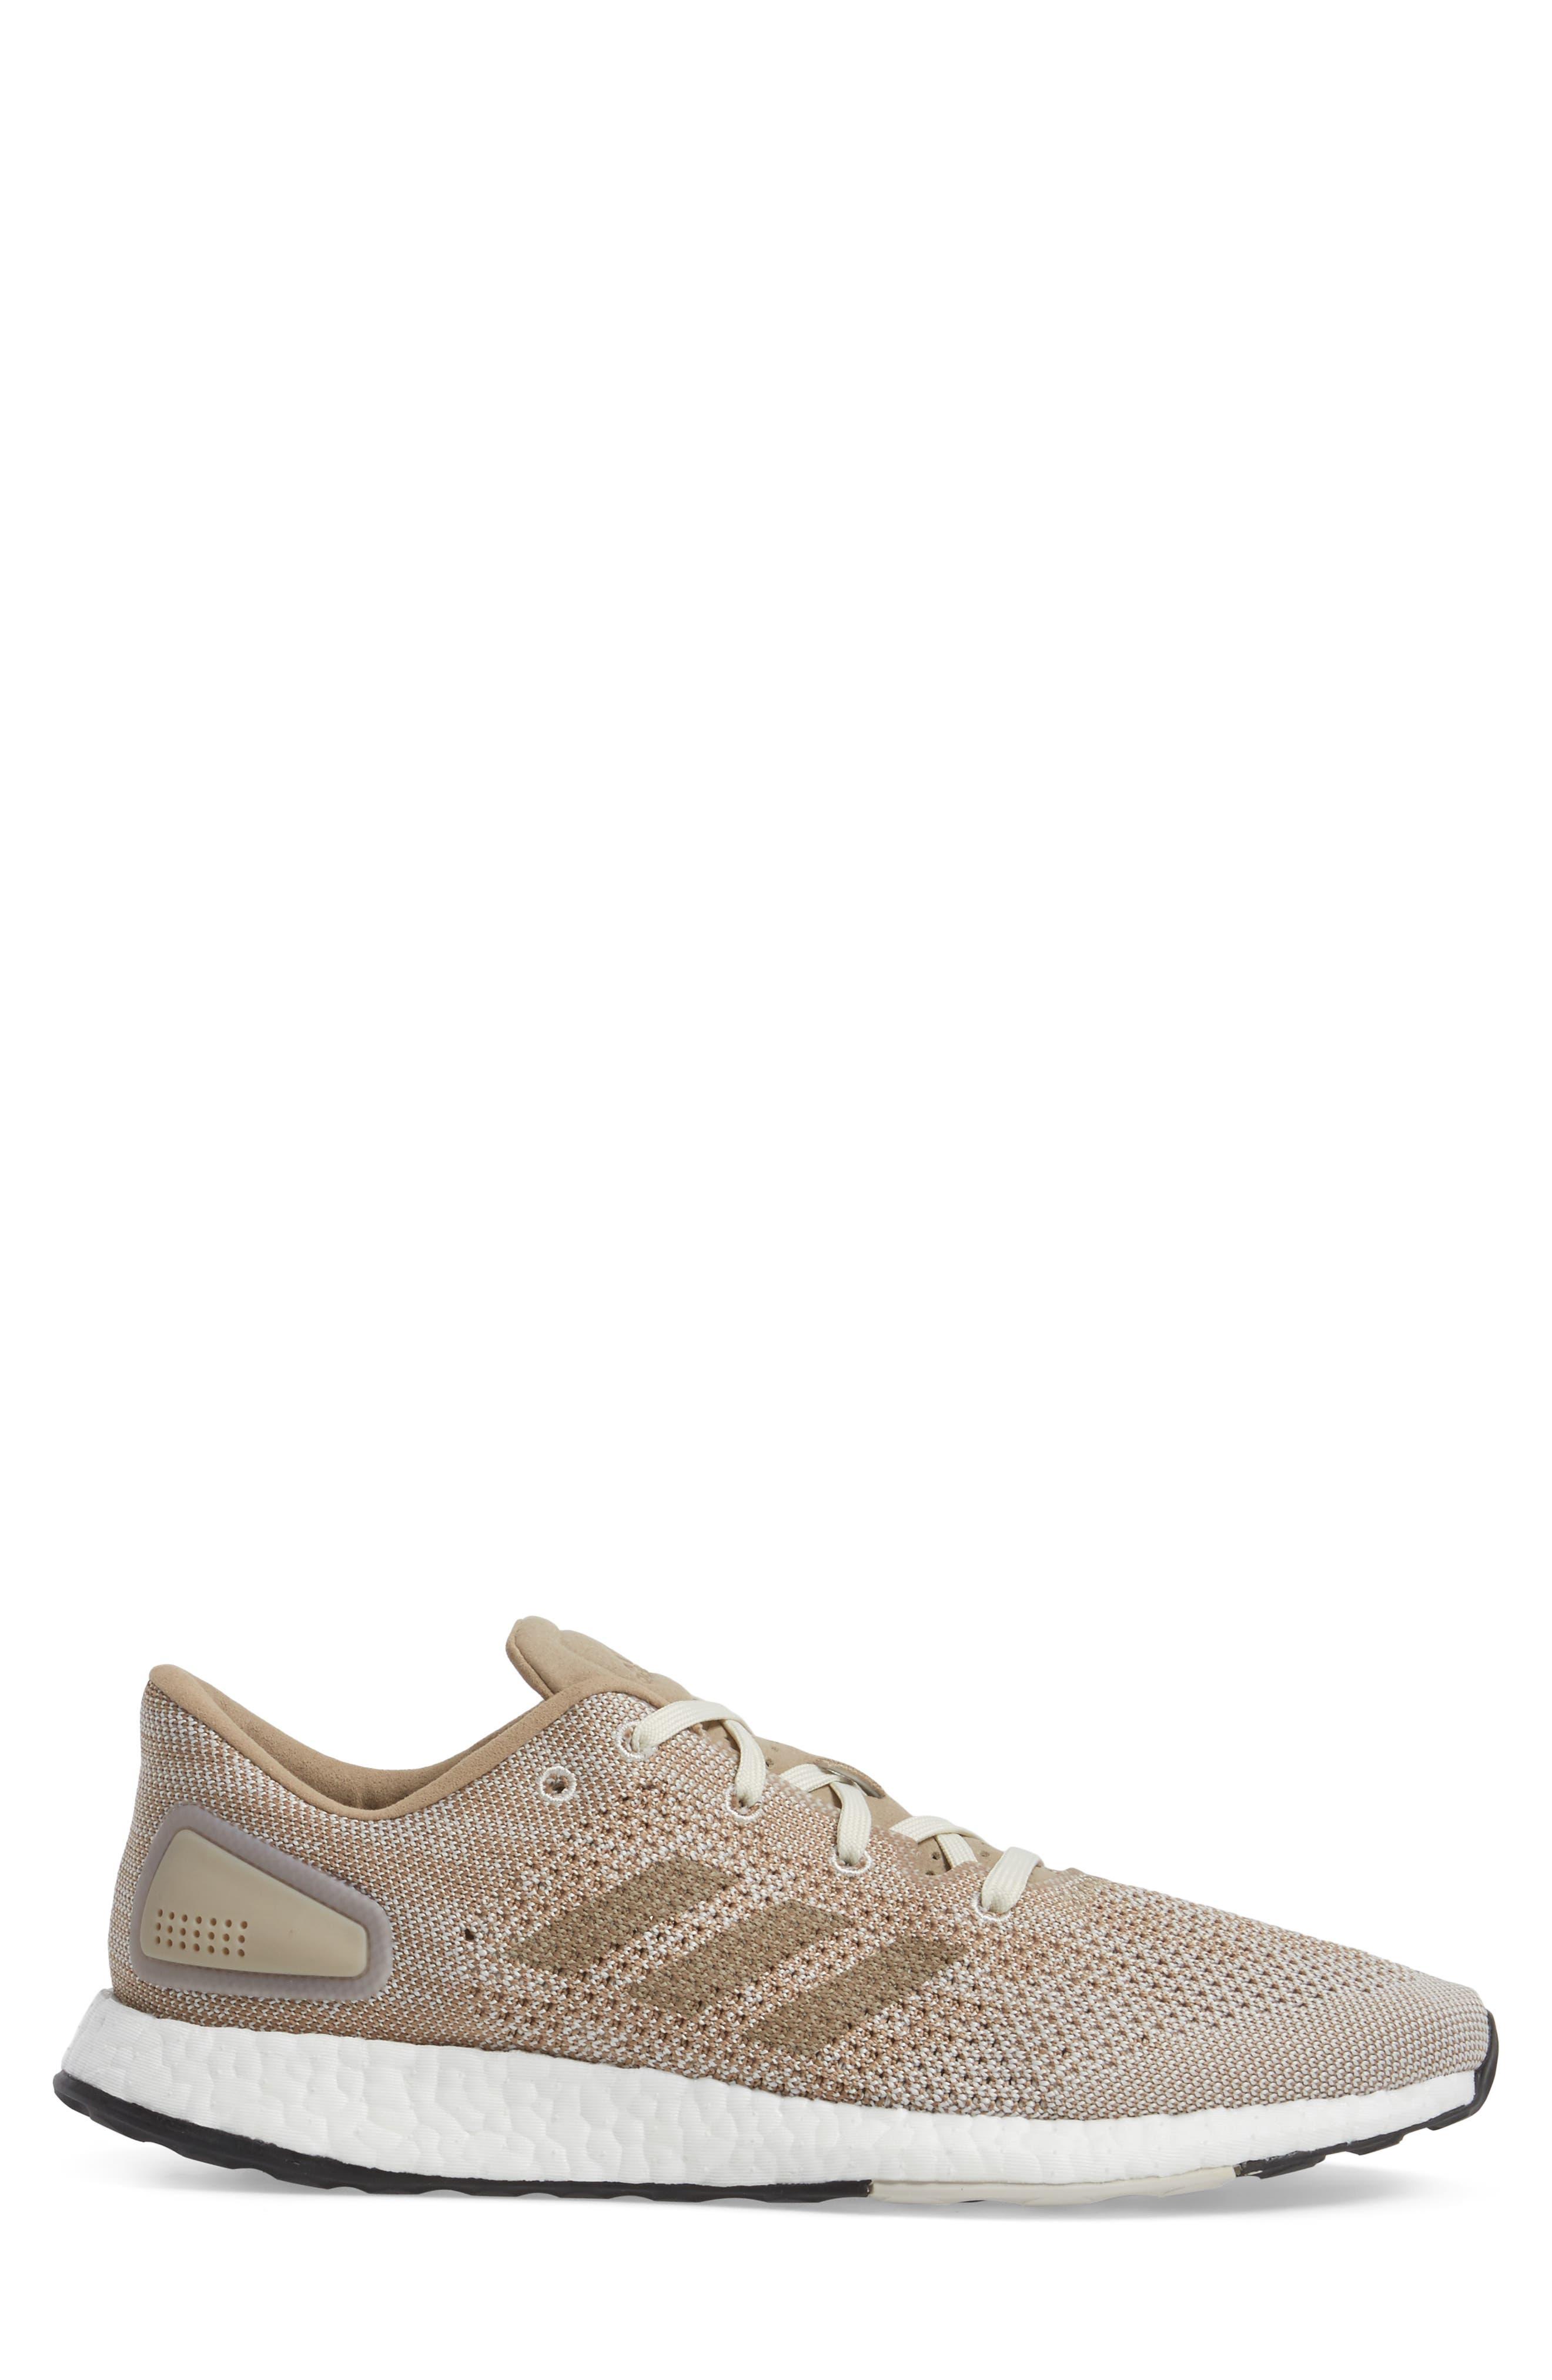 Alternate Image 3  - adidas Pureboost DPR Running Shoe (Men)